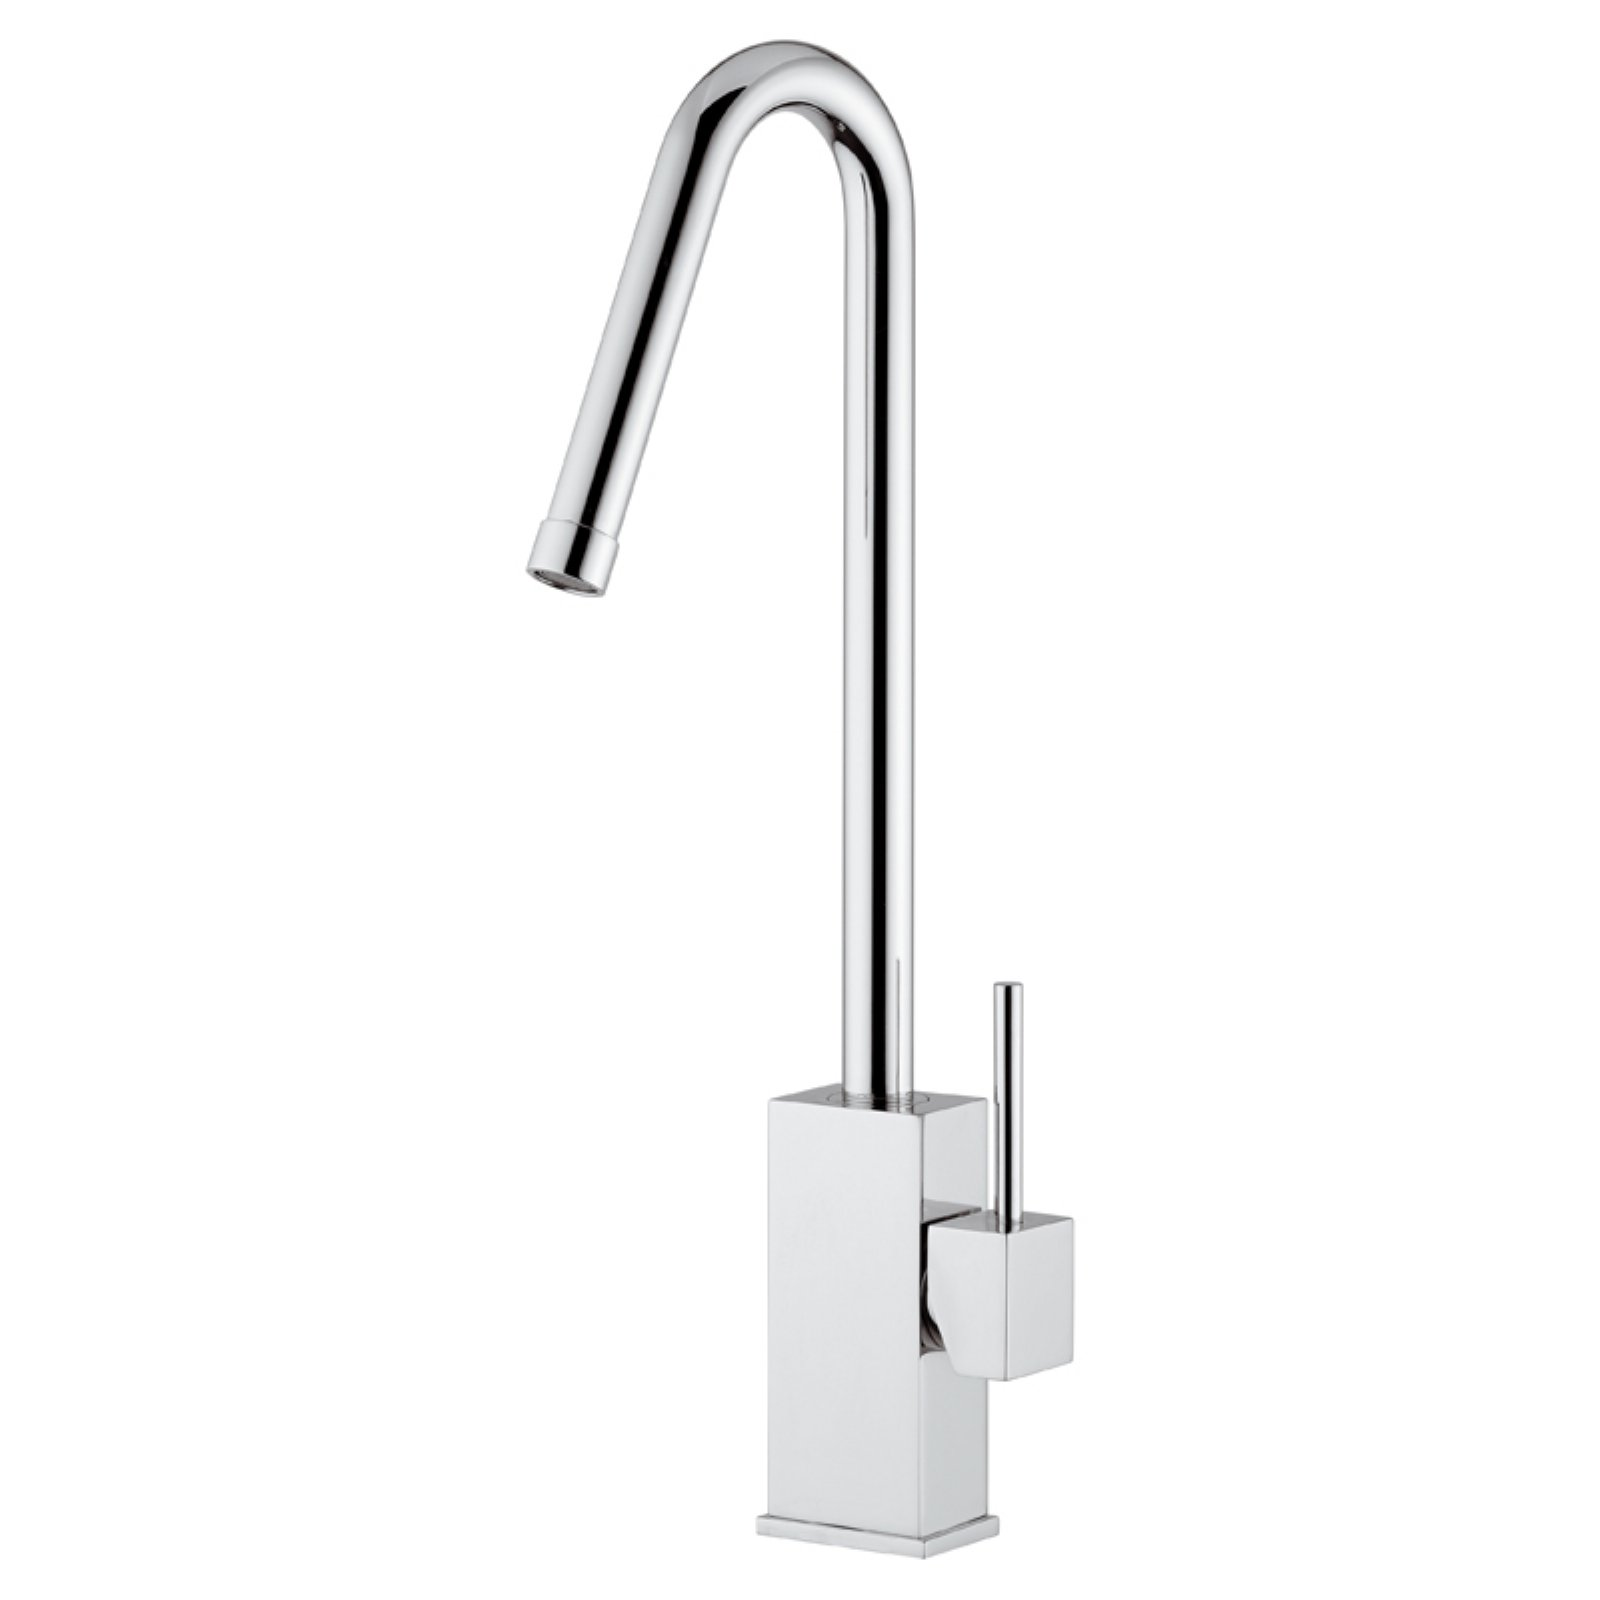 WS Bath Collections Level 180 Single Handle Kitchen Faucet